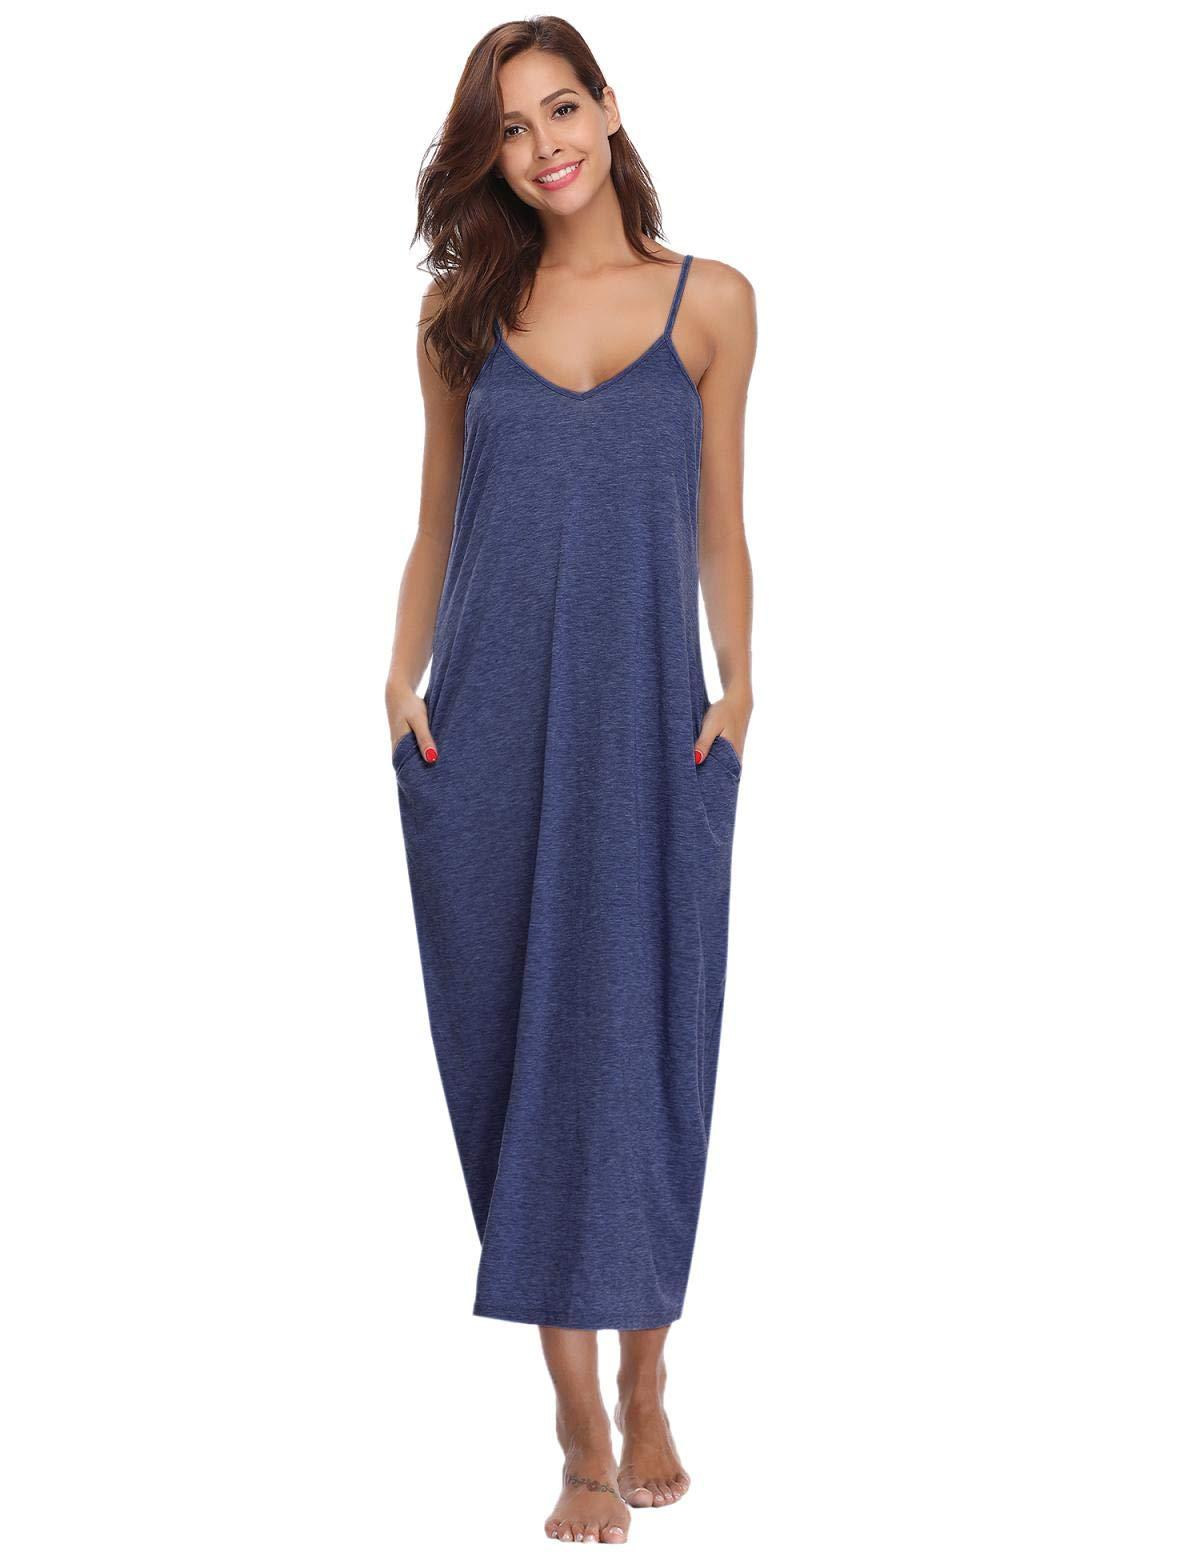 Abollria Womens V-Neck Spaghetti Strap Maxi Dress Summer Casual Loose Dress with Pockets Beach Cami Long Dress Night Dress